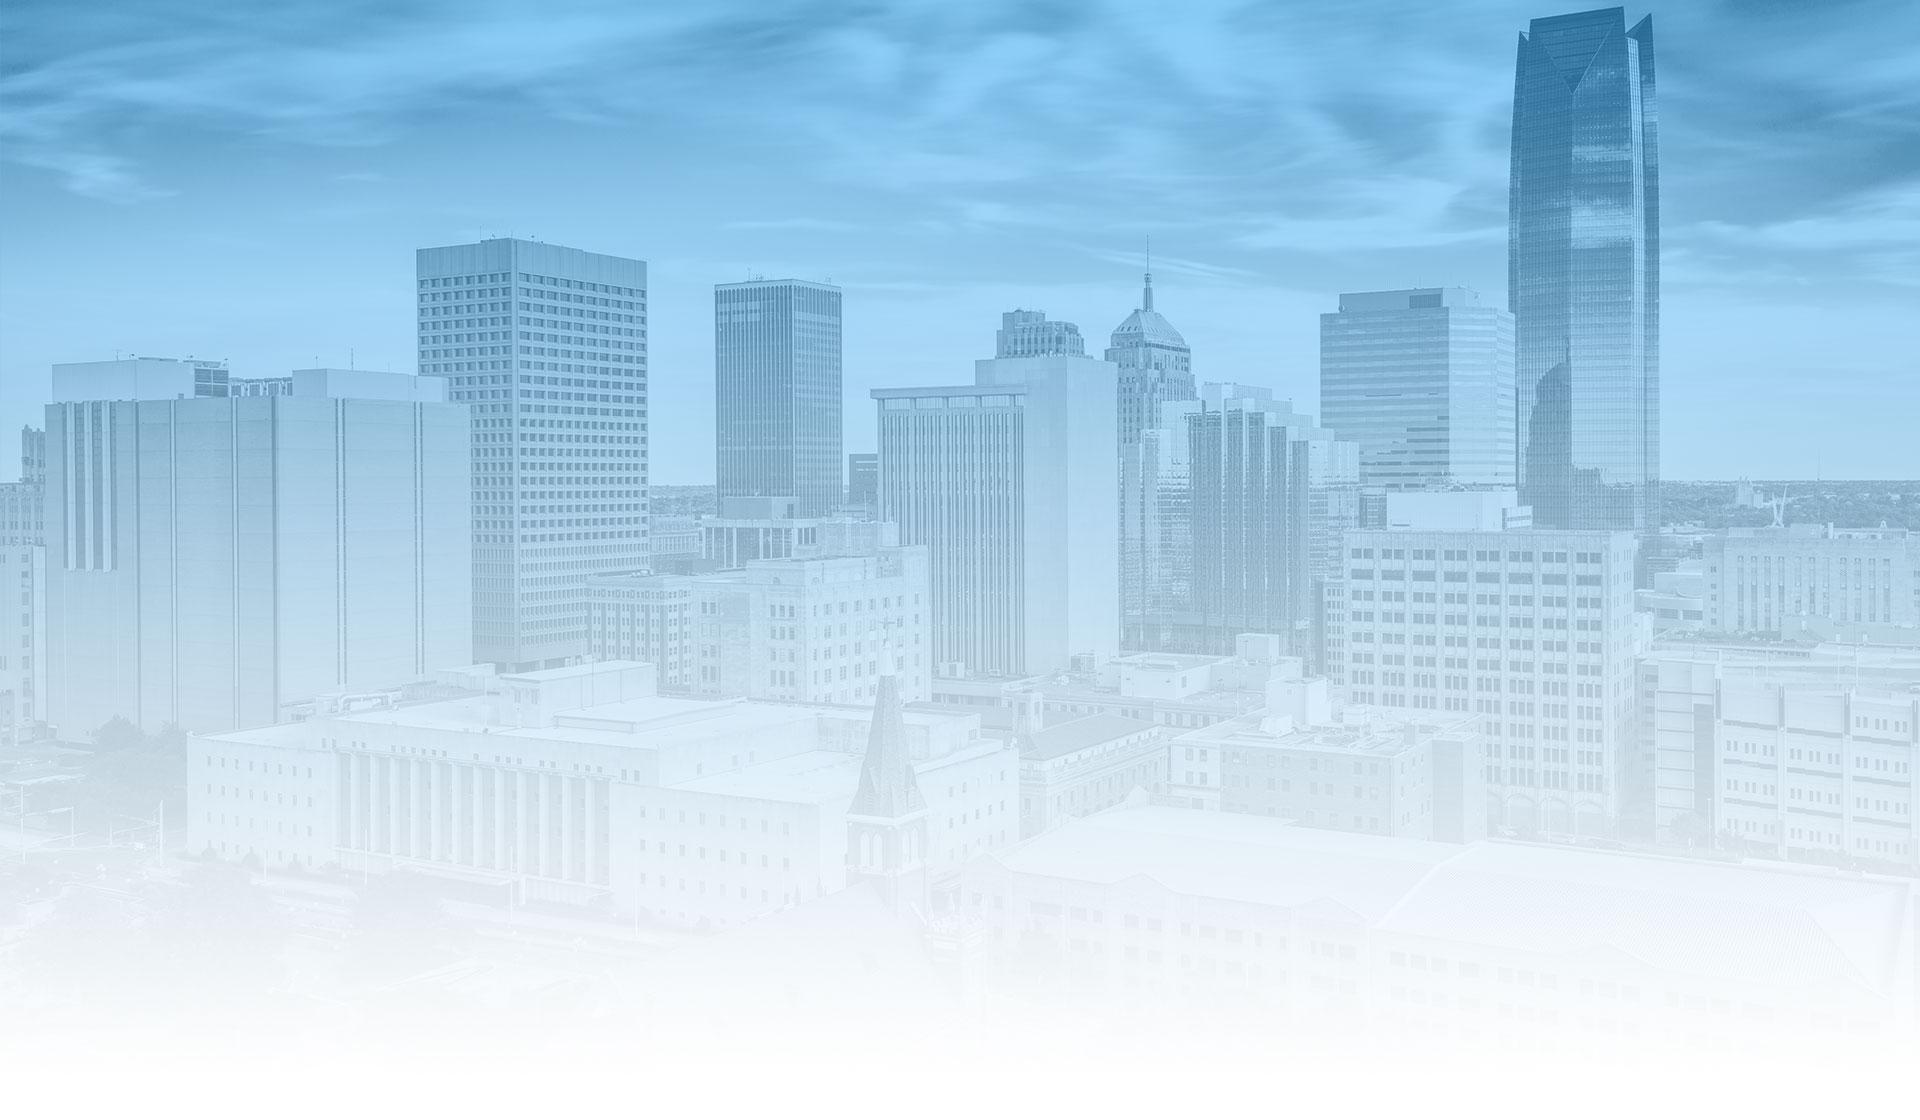 skyline view of oklahoma city